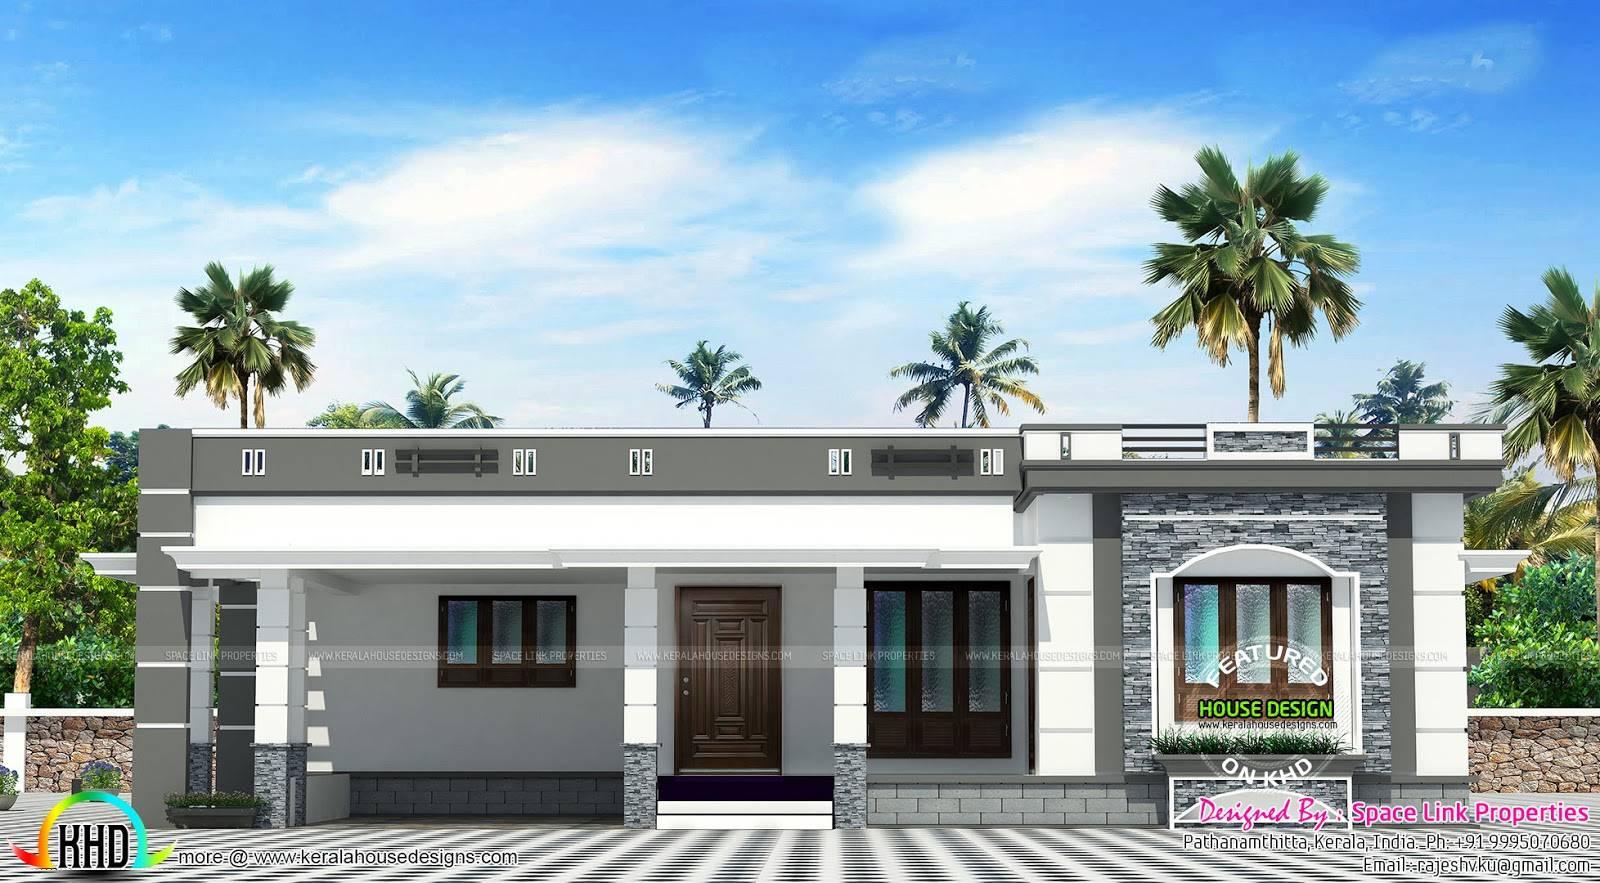 Flat Roof Single Floor Home Kerala Design House Plans 87907